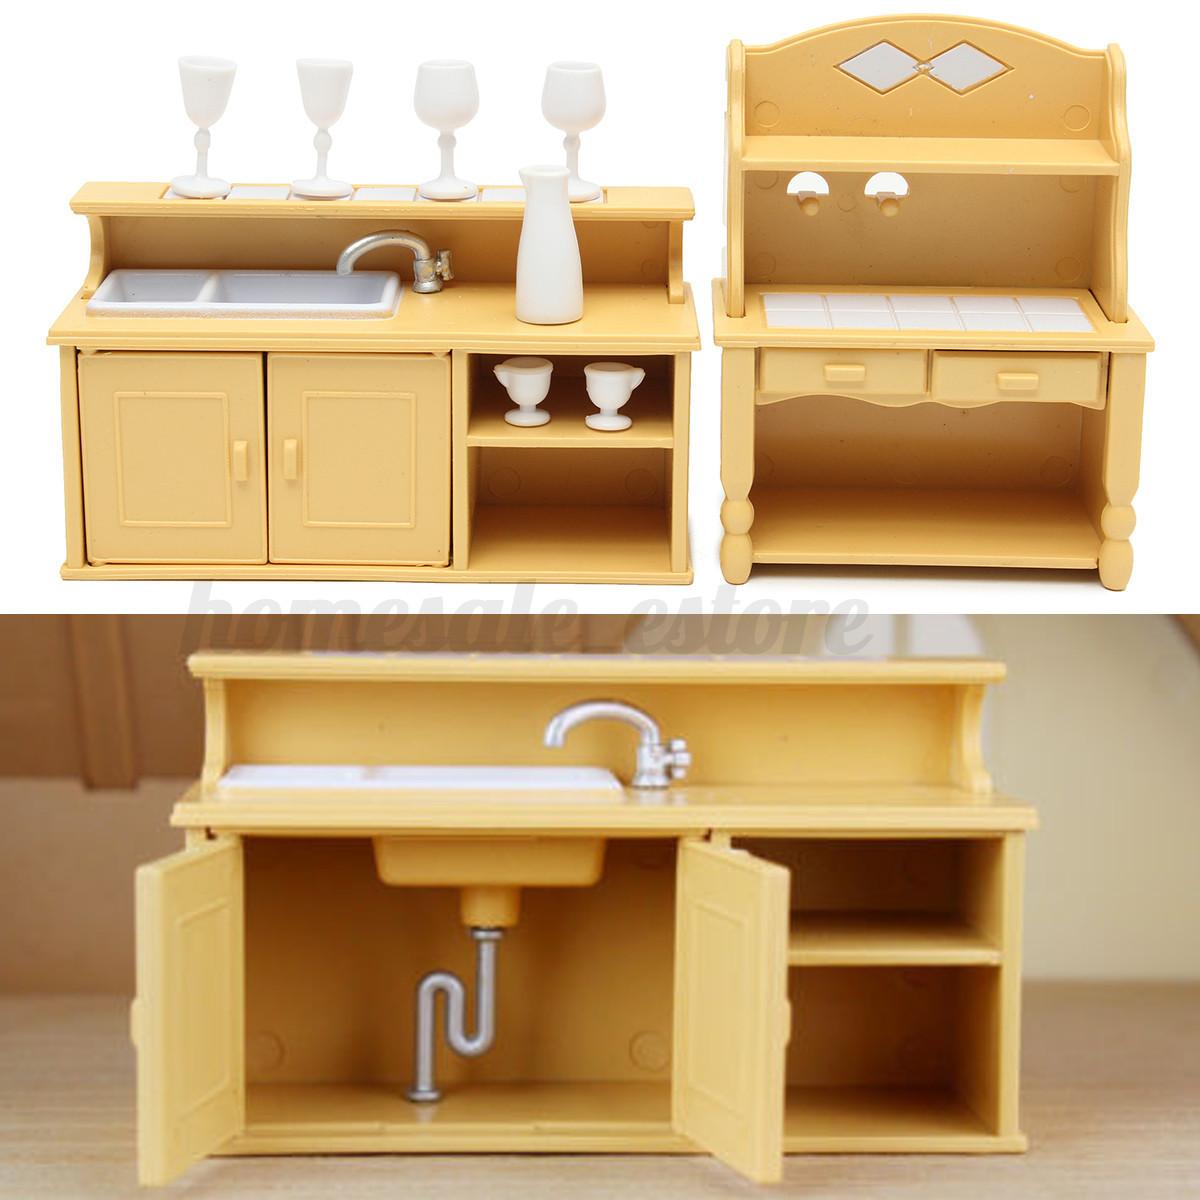 Cabinets plastic kitchen miniature dollhouse furniture for Kids kitchen furniture